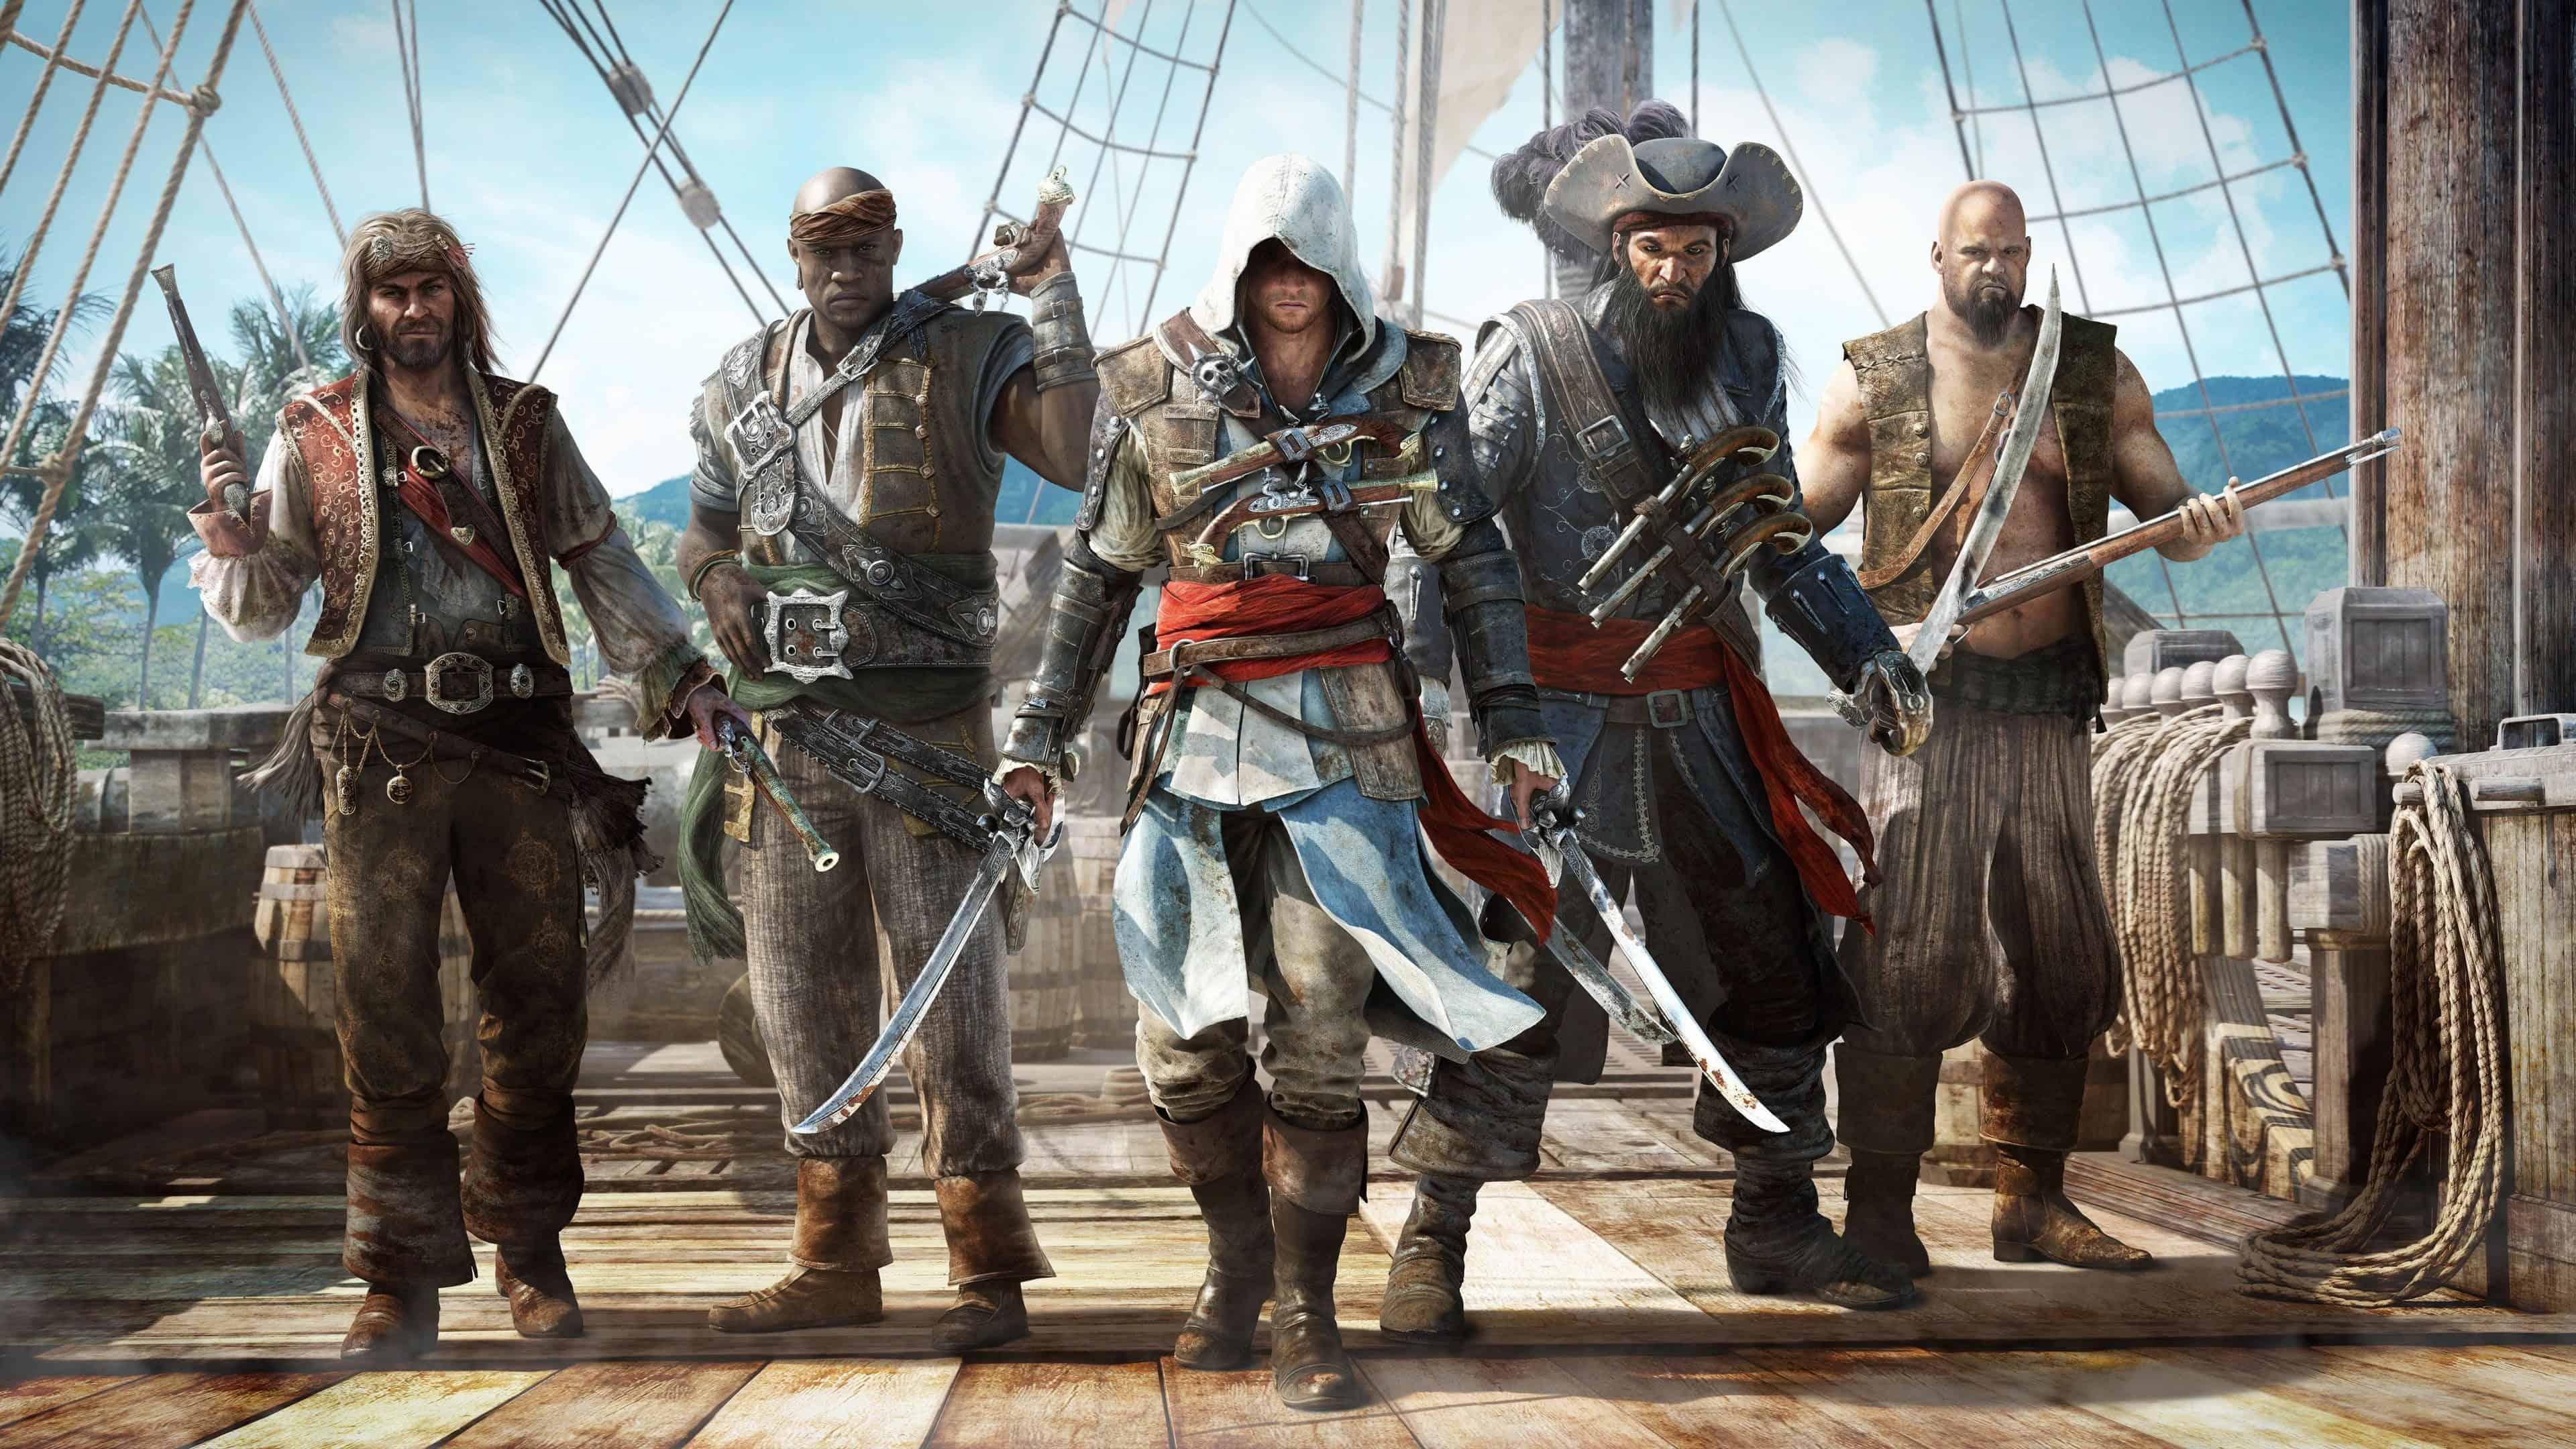 assassins creed 4 black flag uhd 4k wallpaper